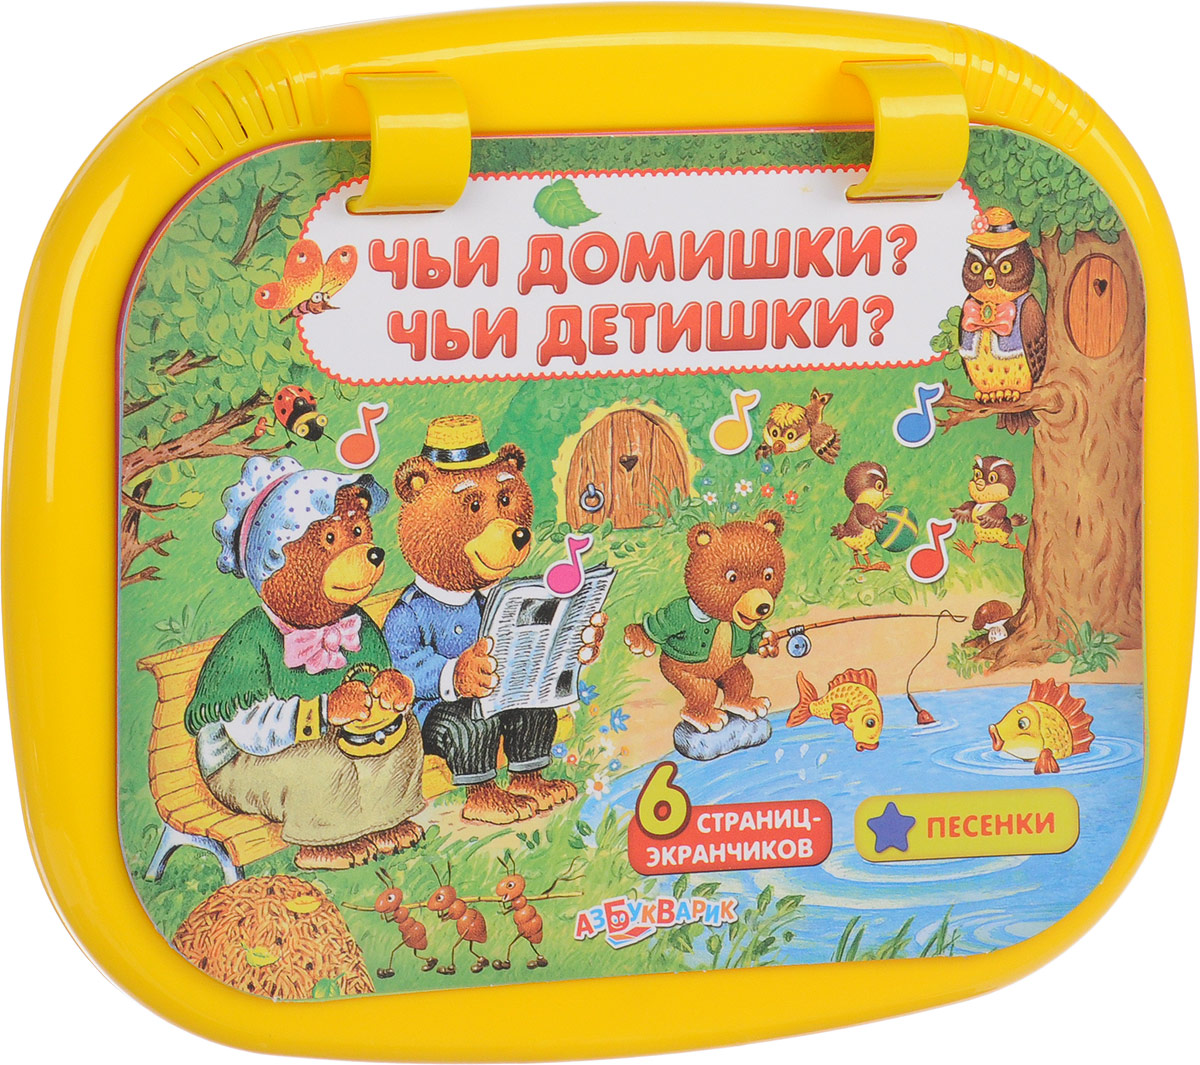 Азбукварик Планшетик Чьи домишки? Чьи детишки? оксана иванова мишка косолапый